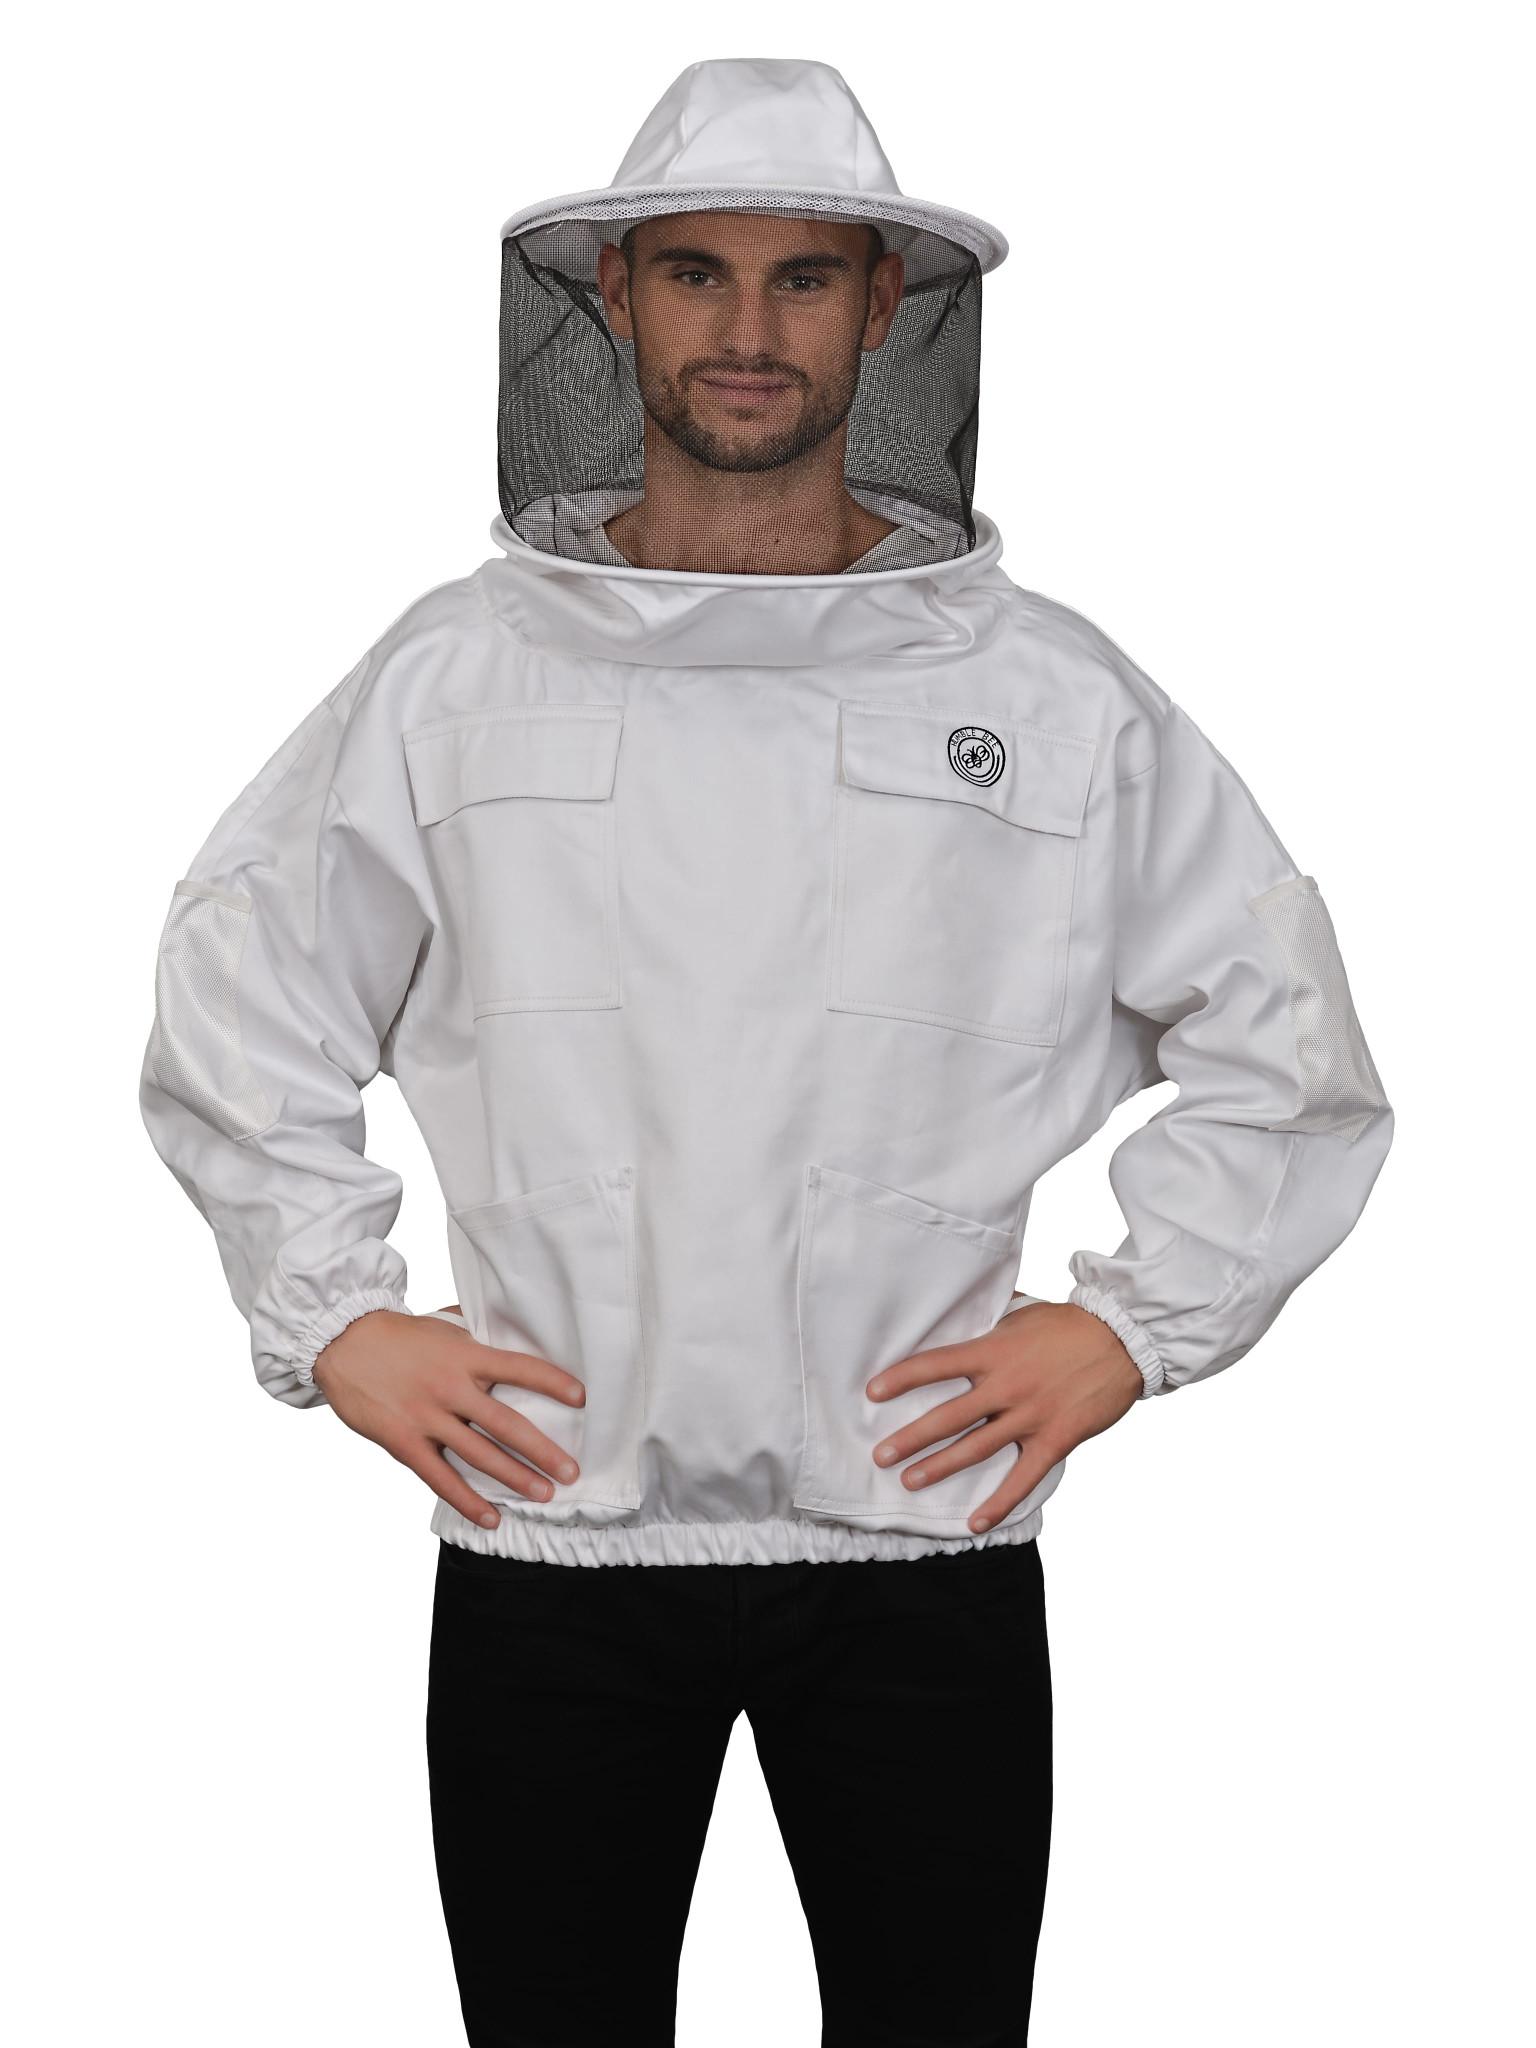 US STOCK Protective Beekeeping Jacket Veil Smock Equipment Bee Keeping Hat Suit